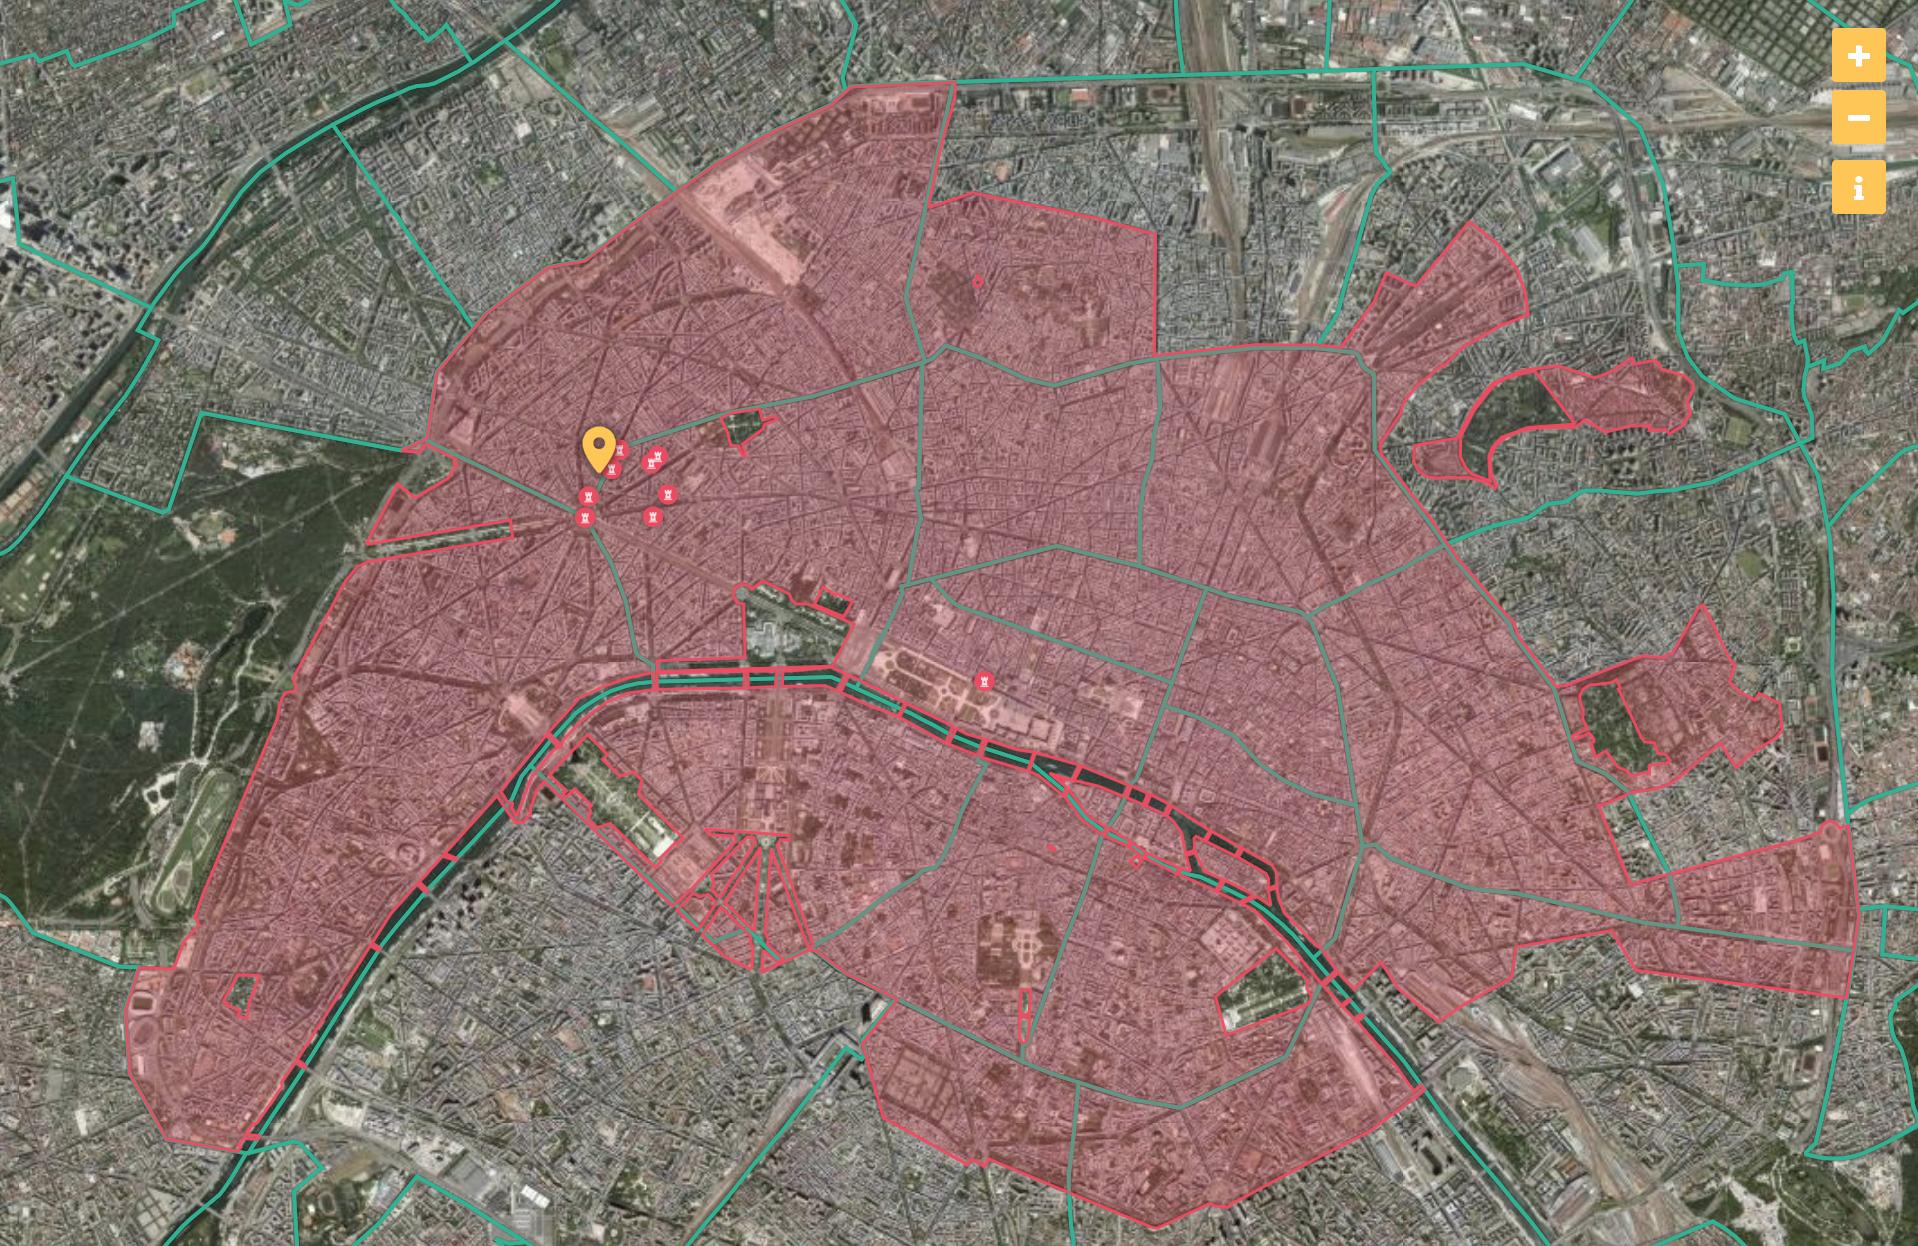 Dissolve GeoJSON : Please have a talk with w8r/martinez · Issue #14